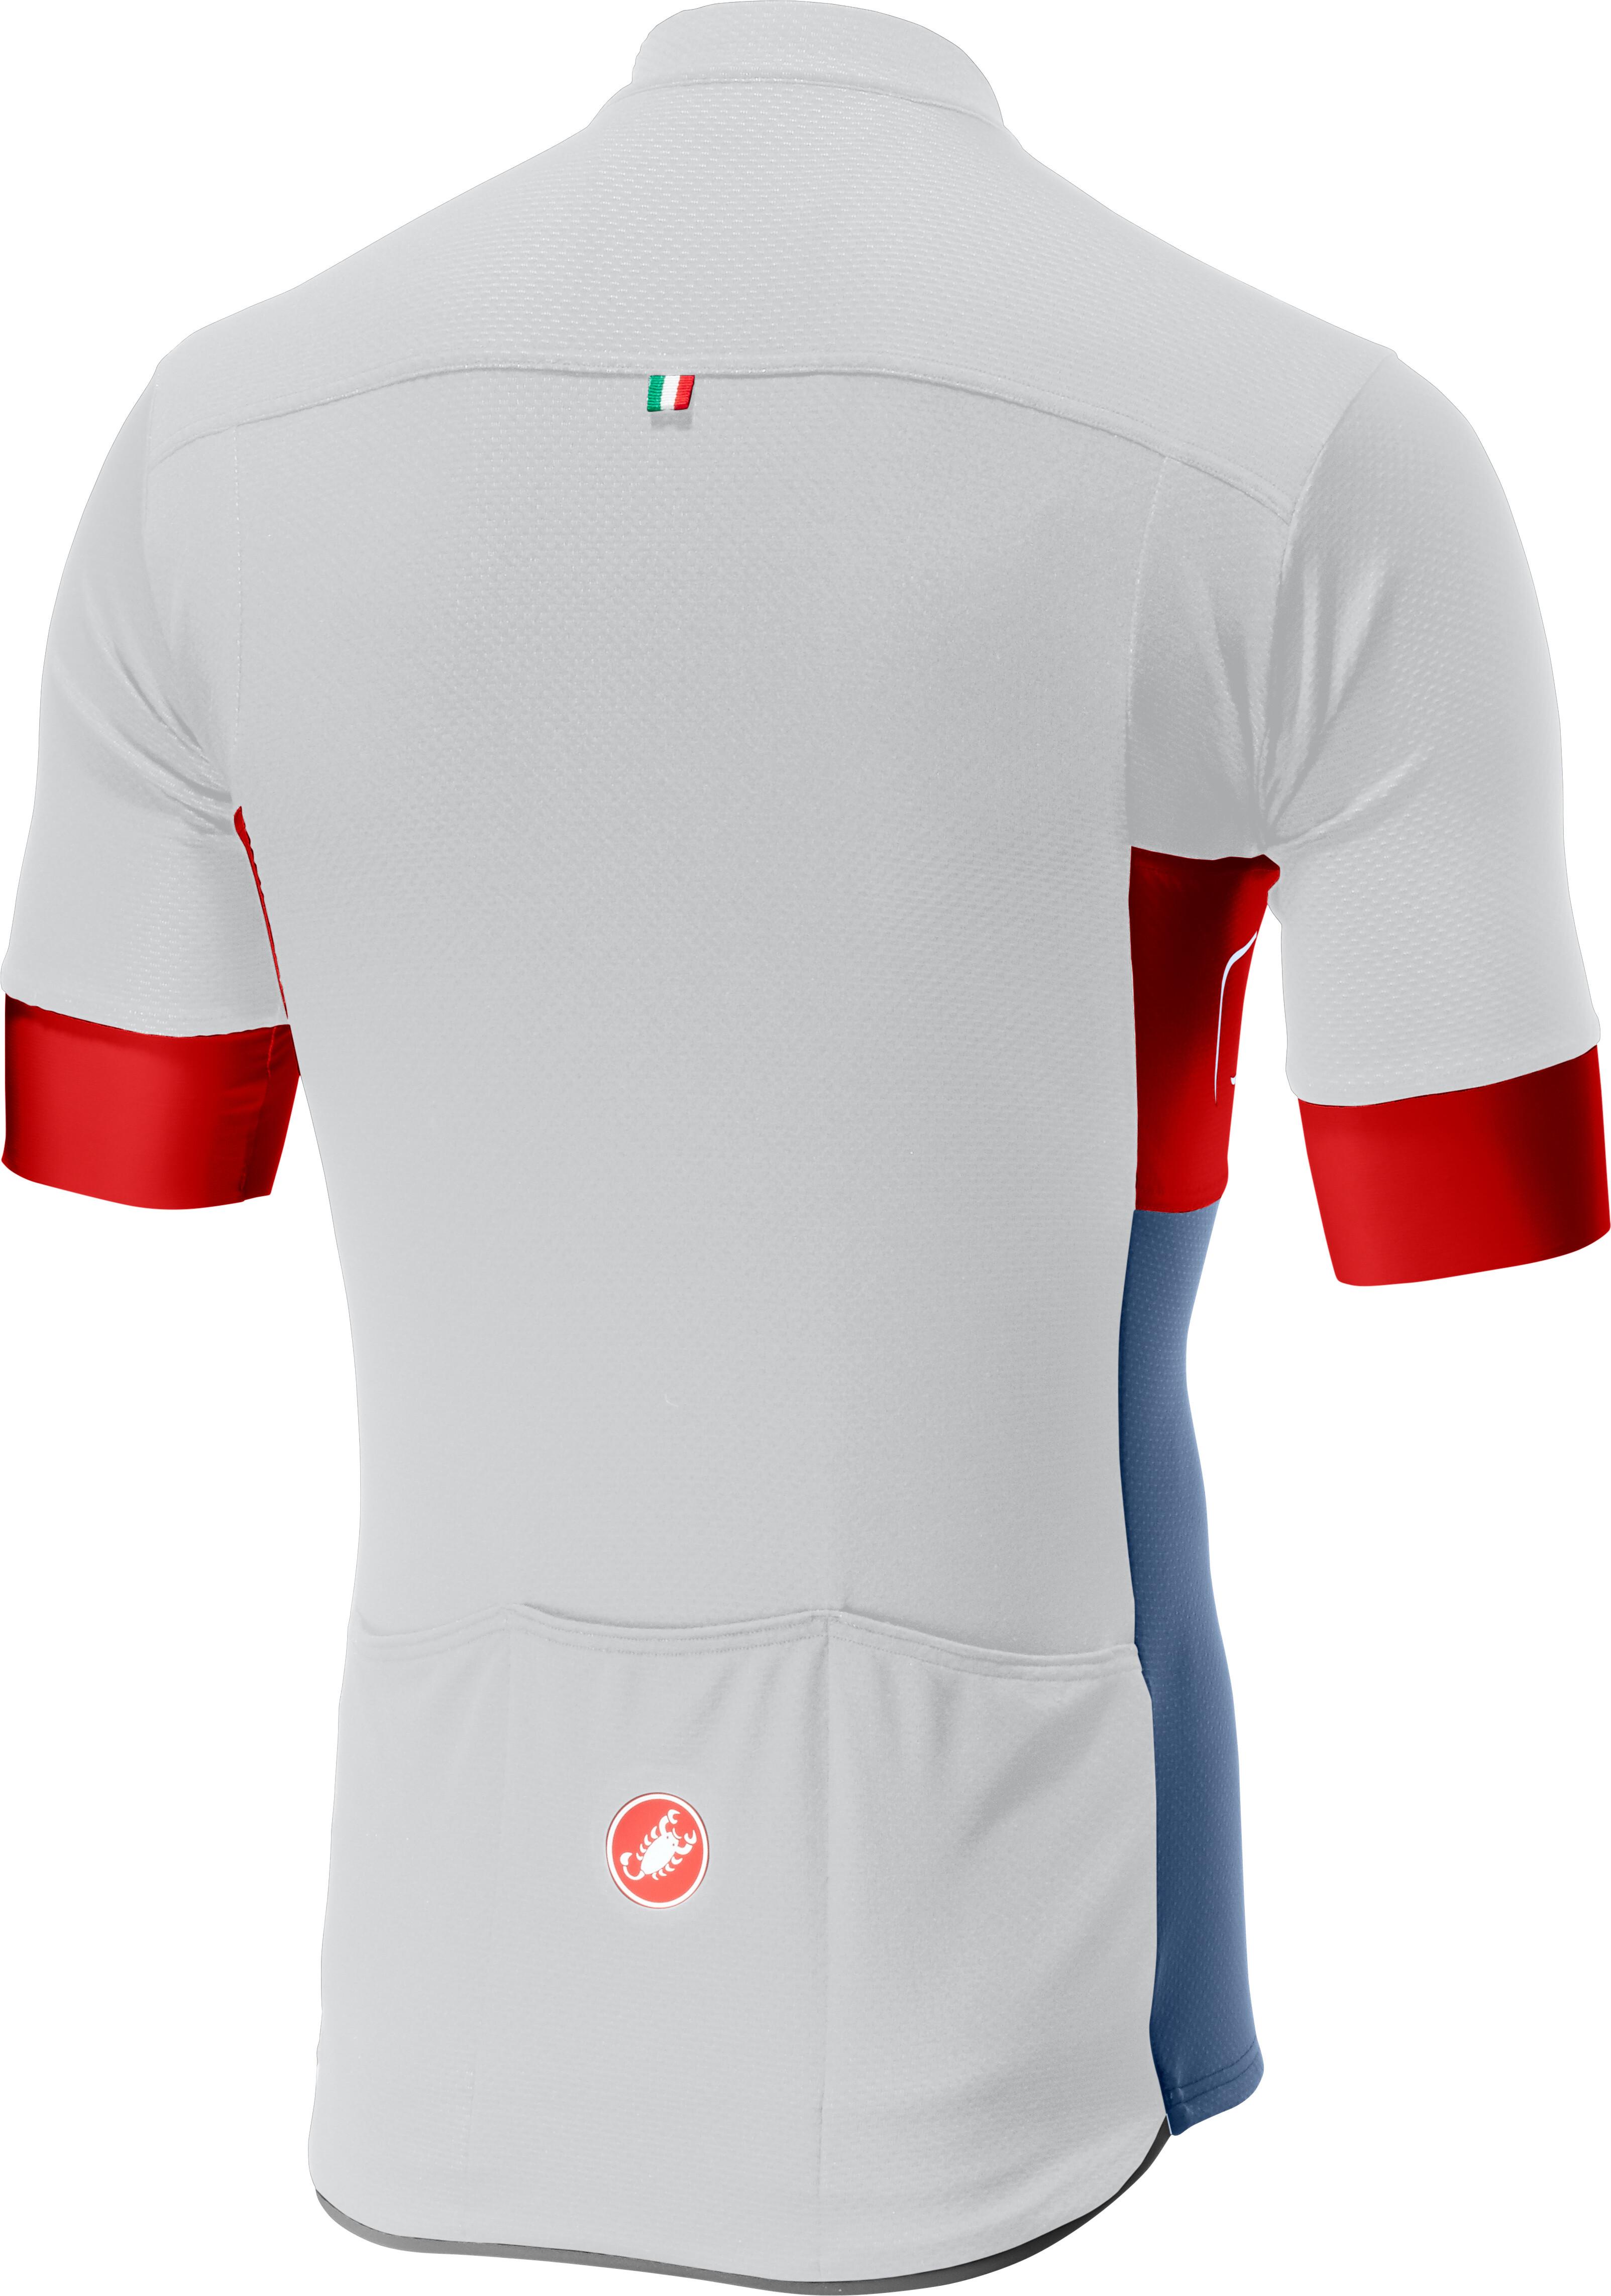 Castelli Prologo VI Bike Jersey Shortsleeve Men colourful at ... 51145843f